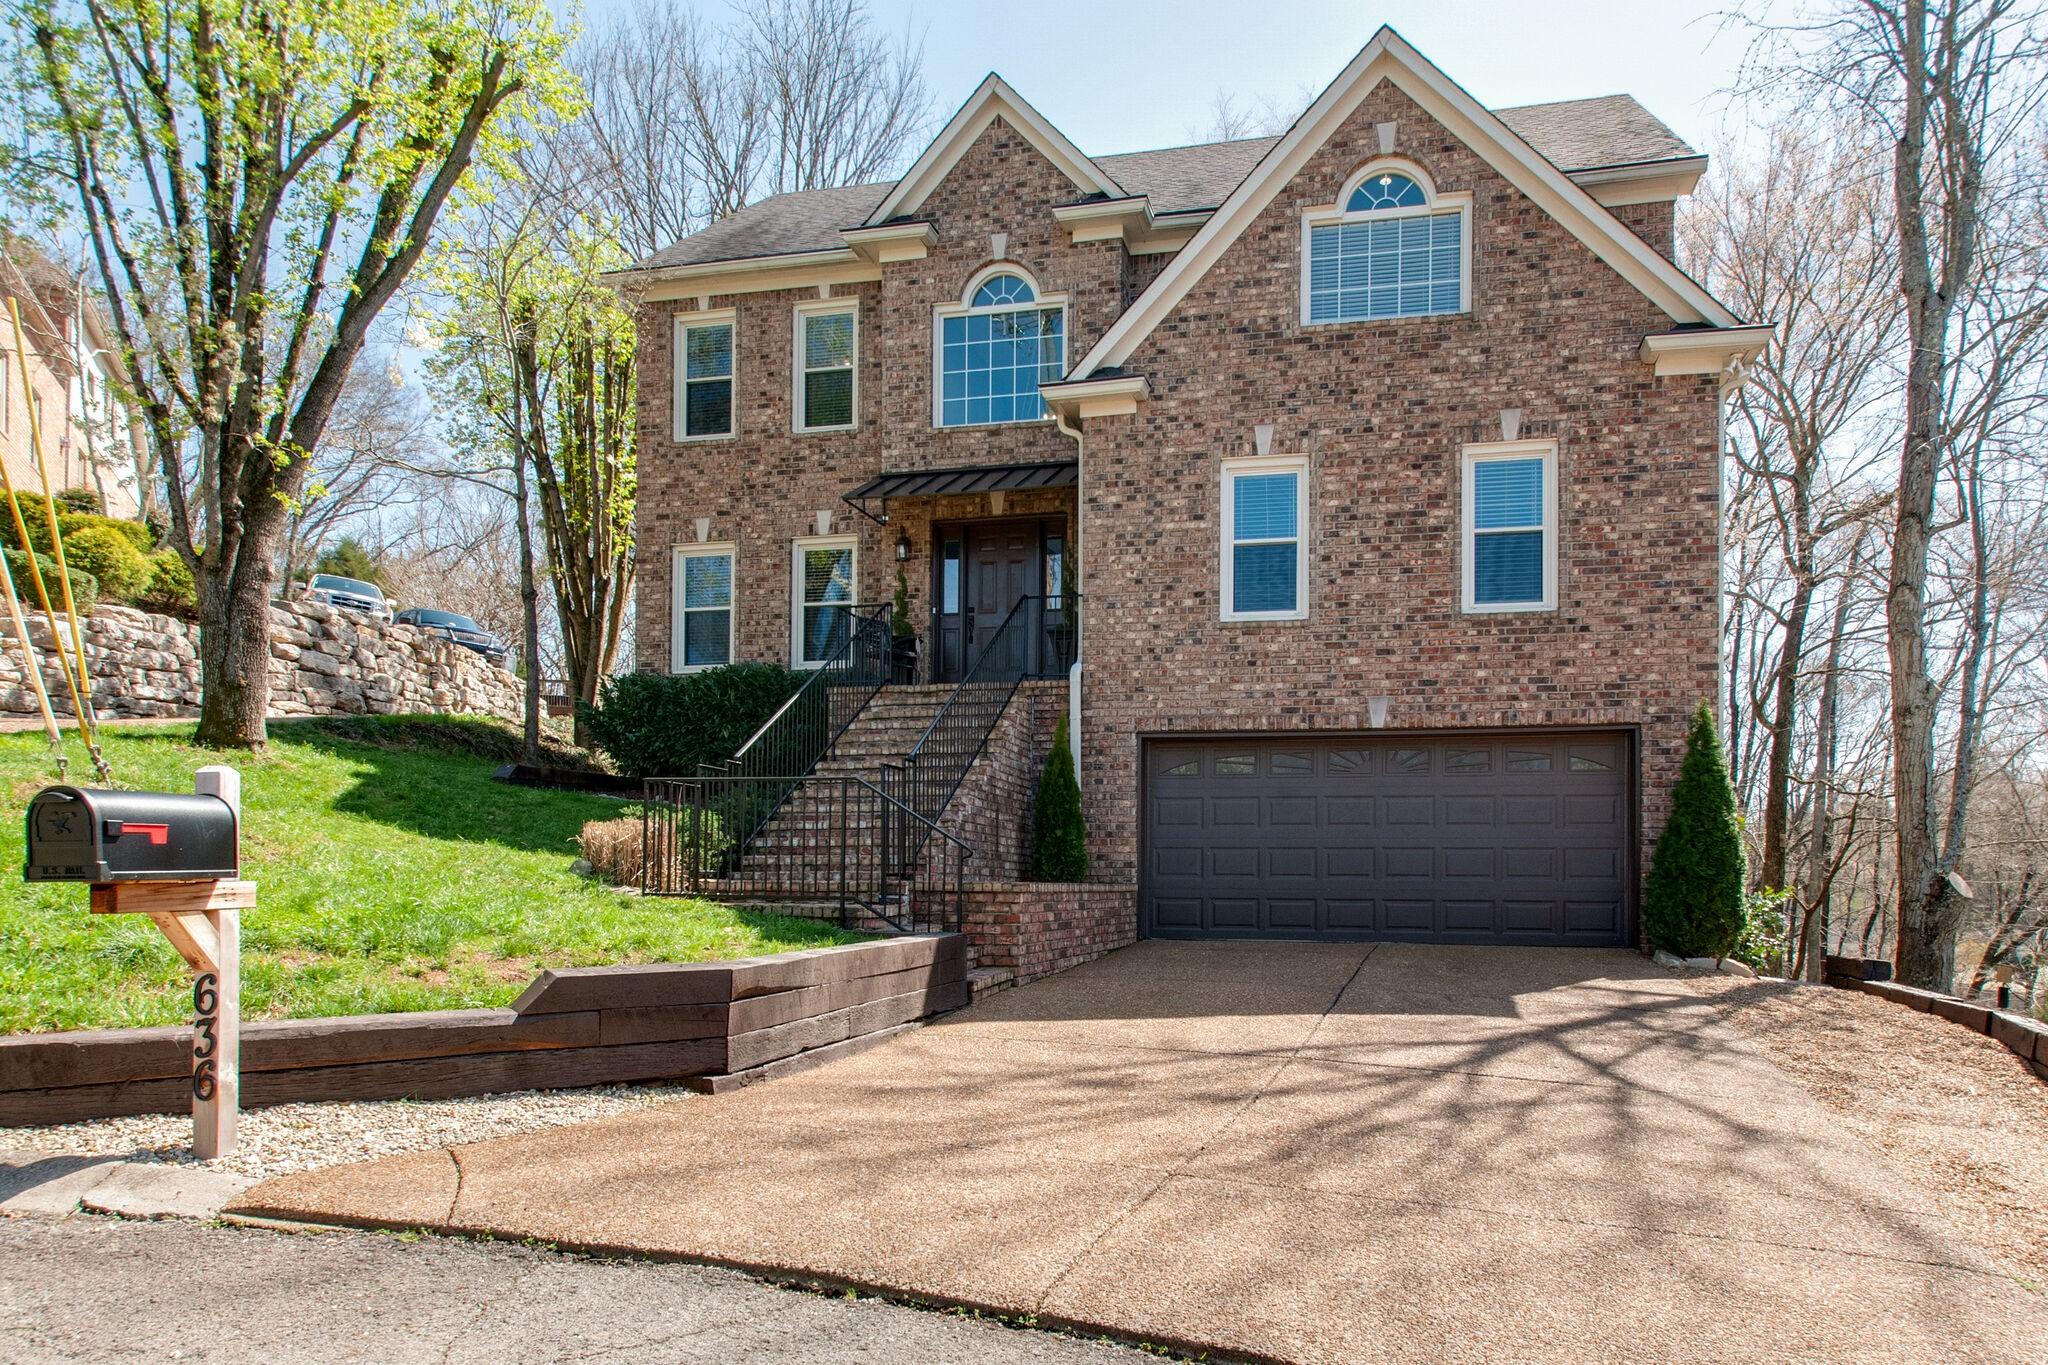 636 Indian Ridge Dr Property Photo - Nashville, TN real estate listing